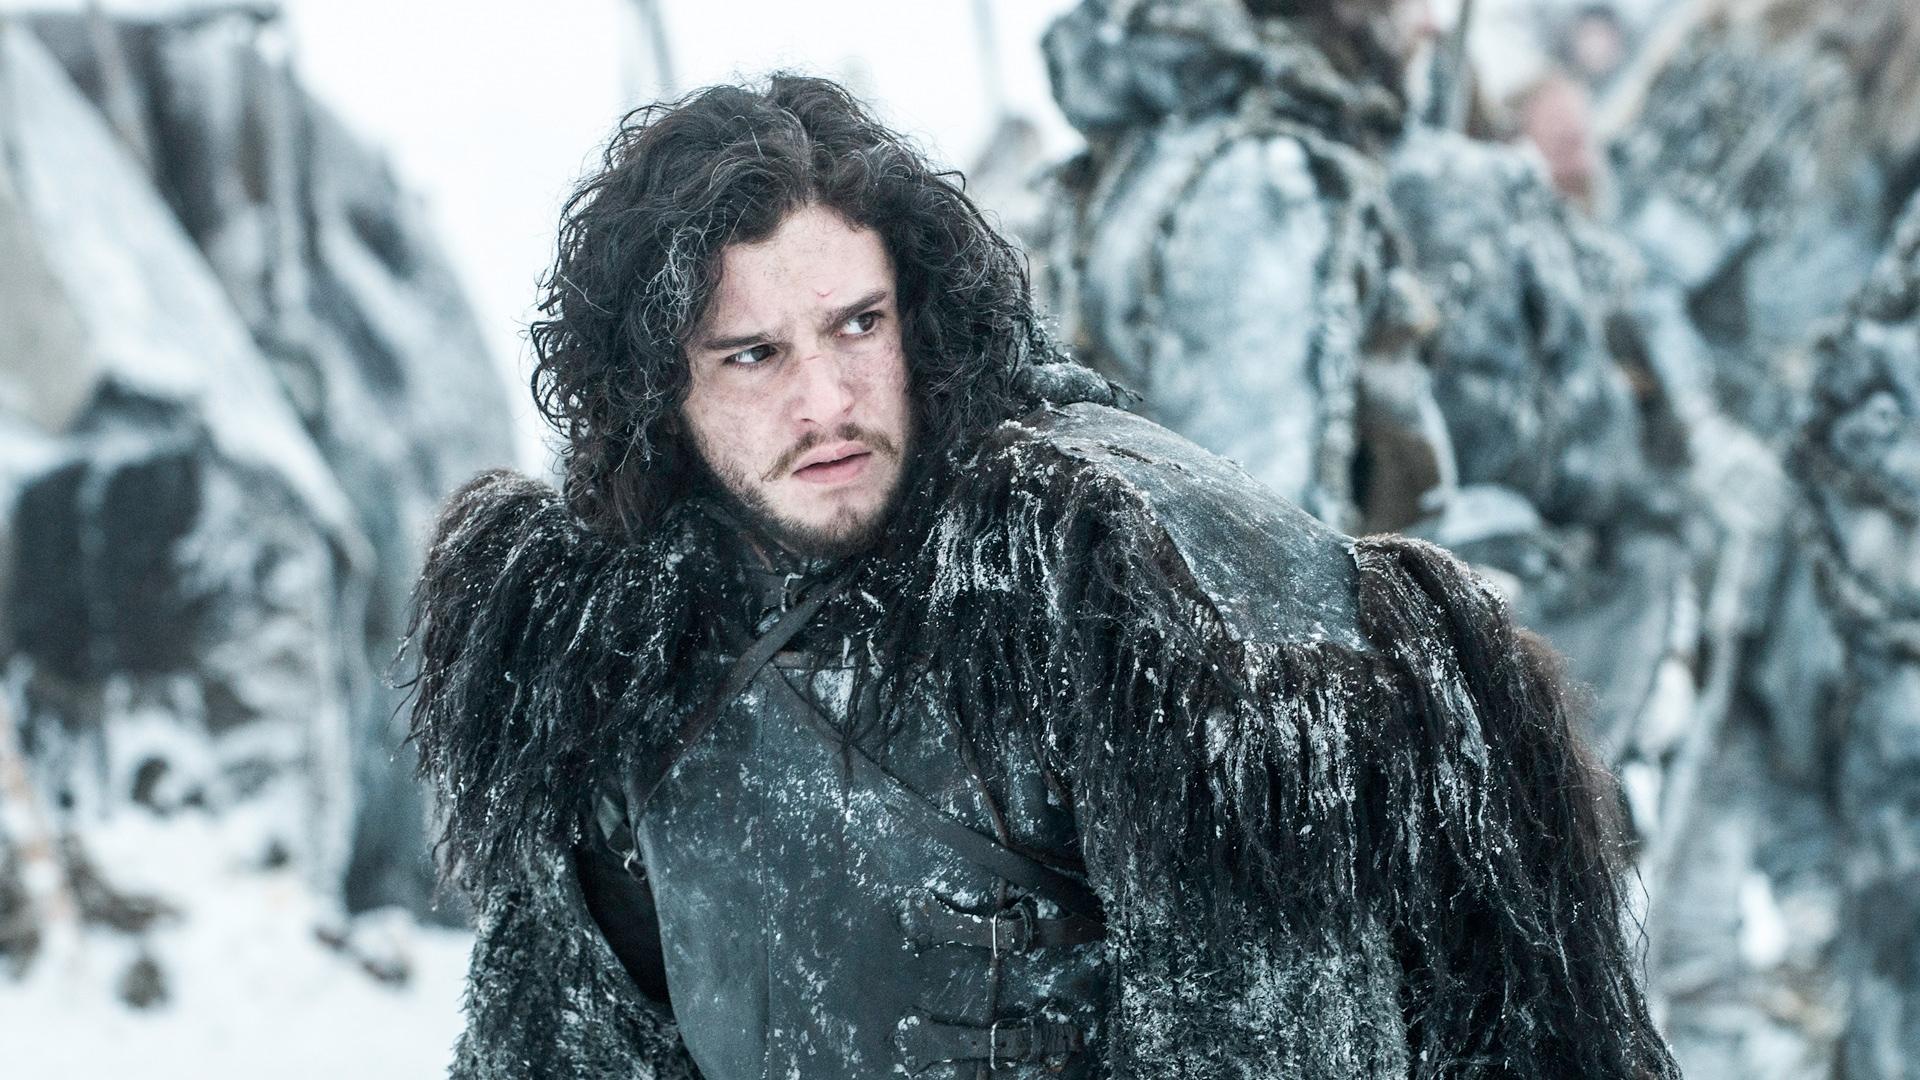 Jon Snow   Game of Thrones Wallpaper 1920x1080 41996 1920x1080